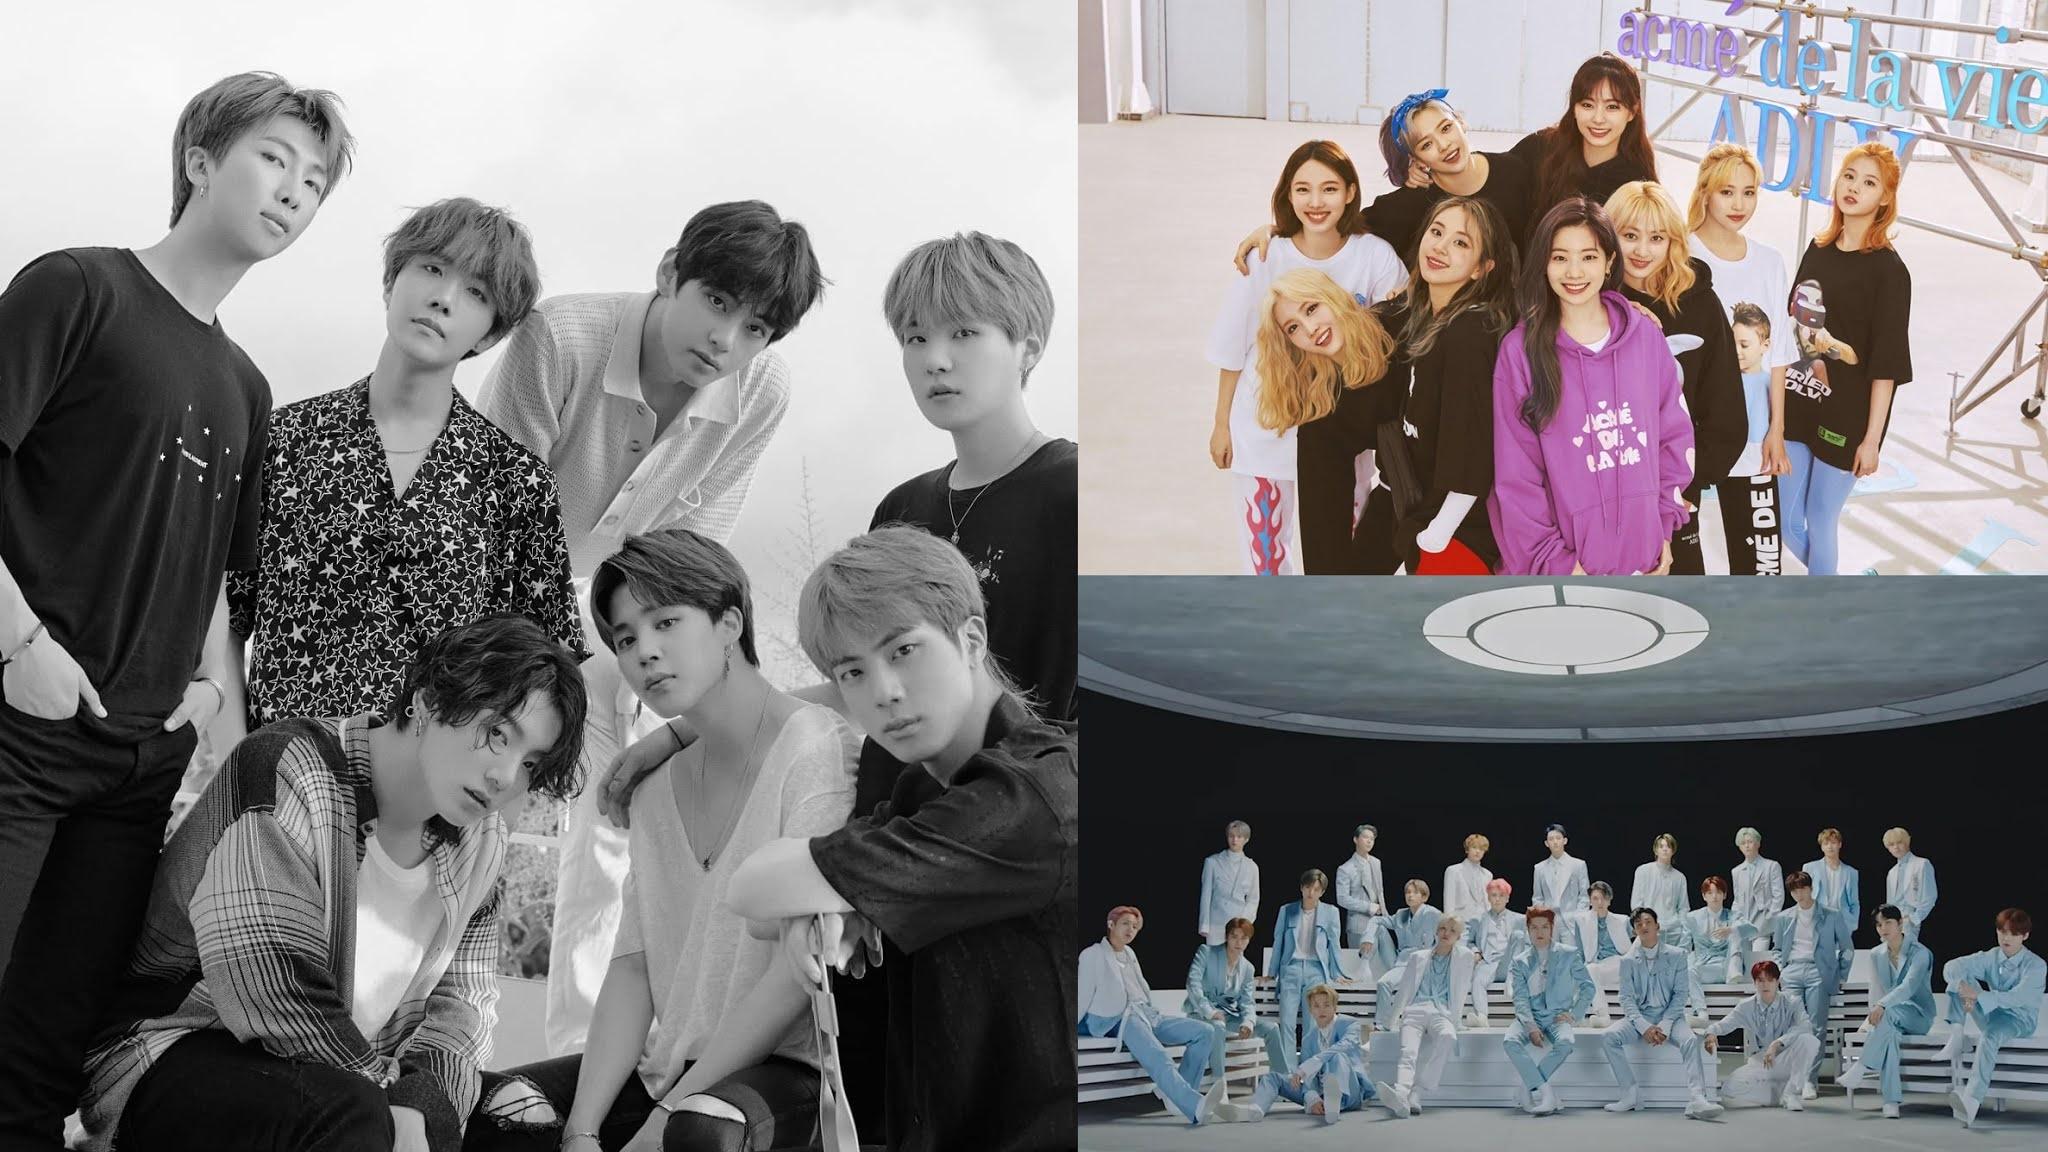 List of K-Pop Groups Brand Reputation in November